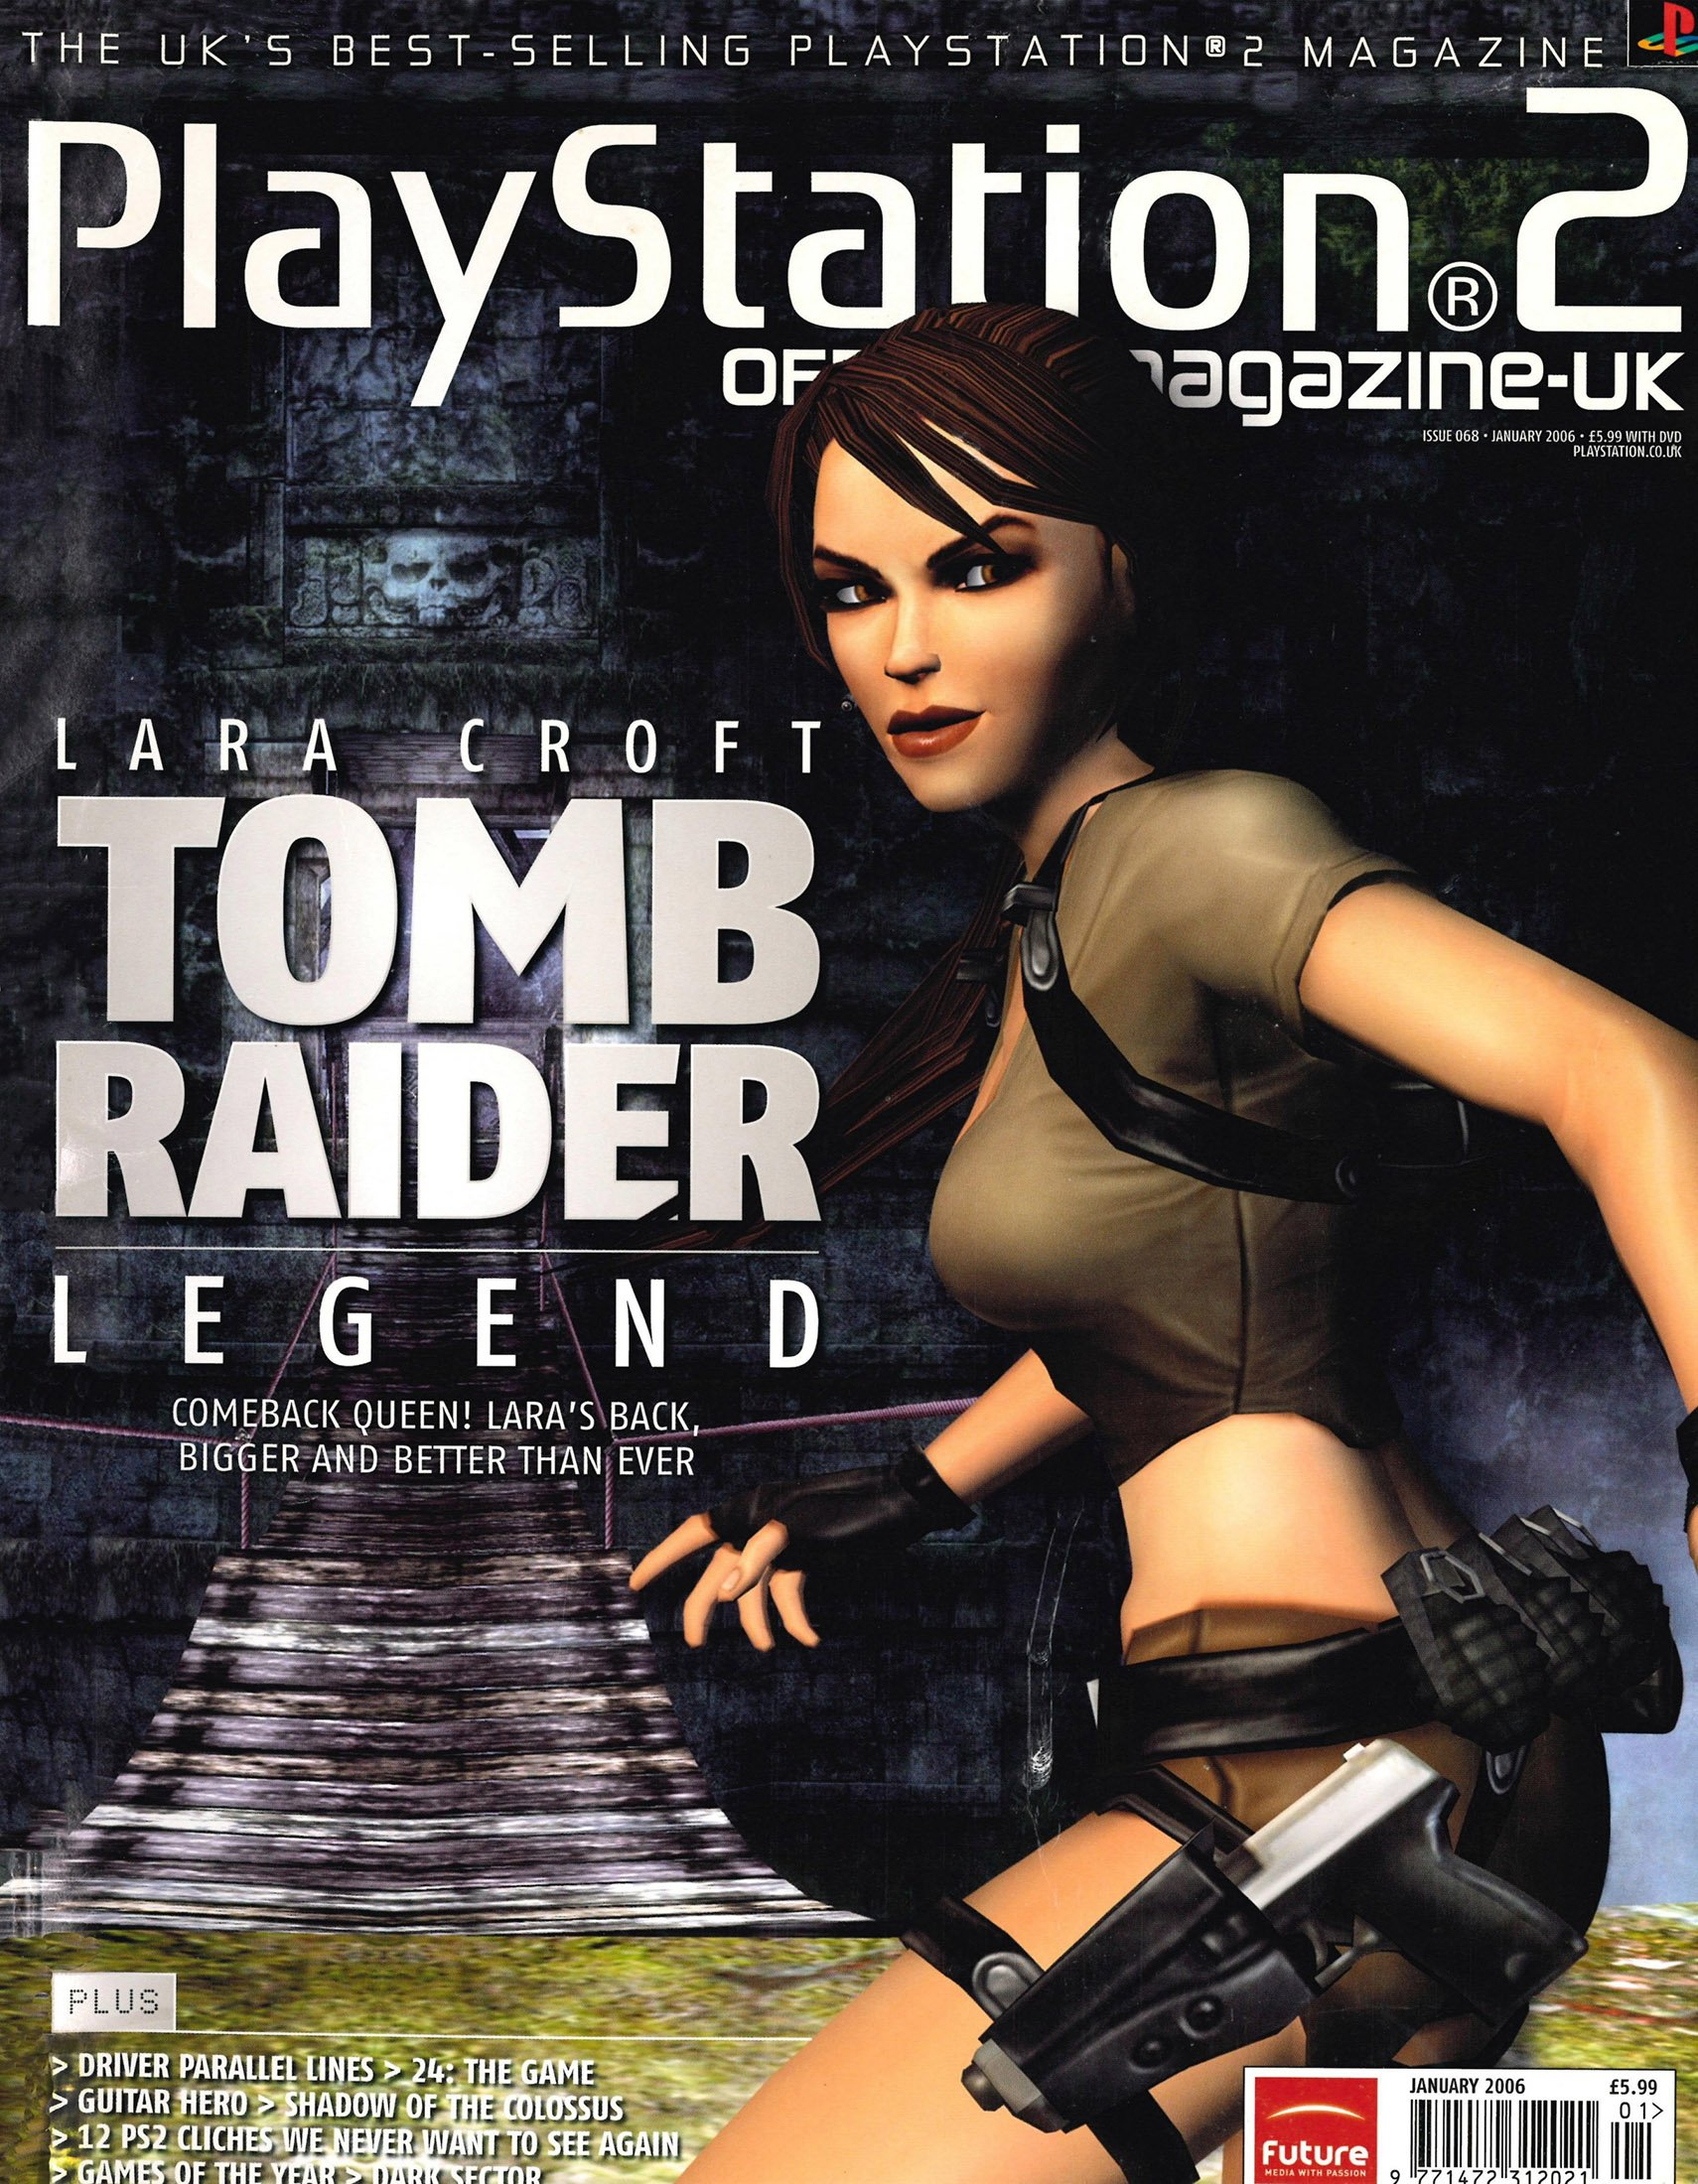 Official Playstation 2 Magazine UK 068 (January 2006)